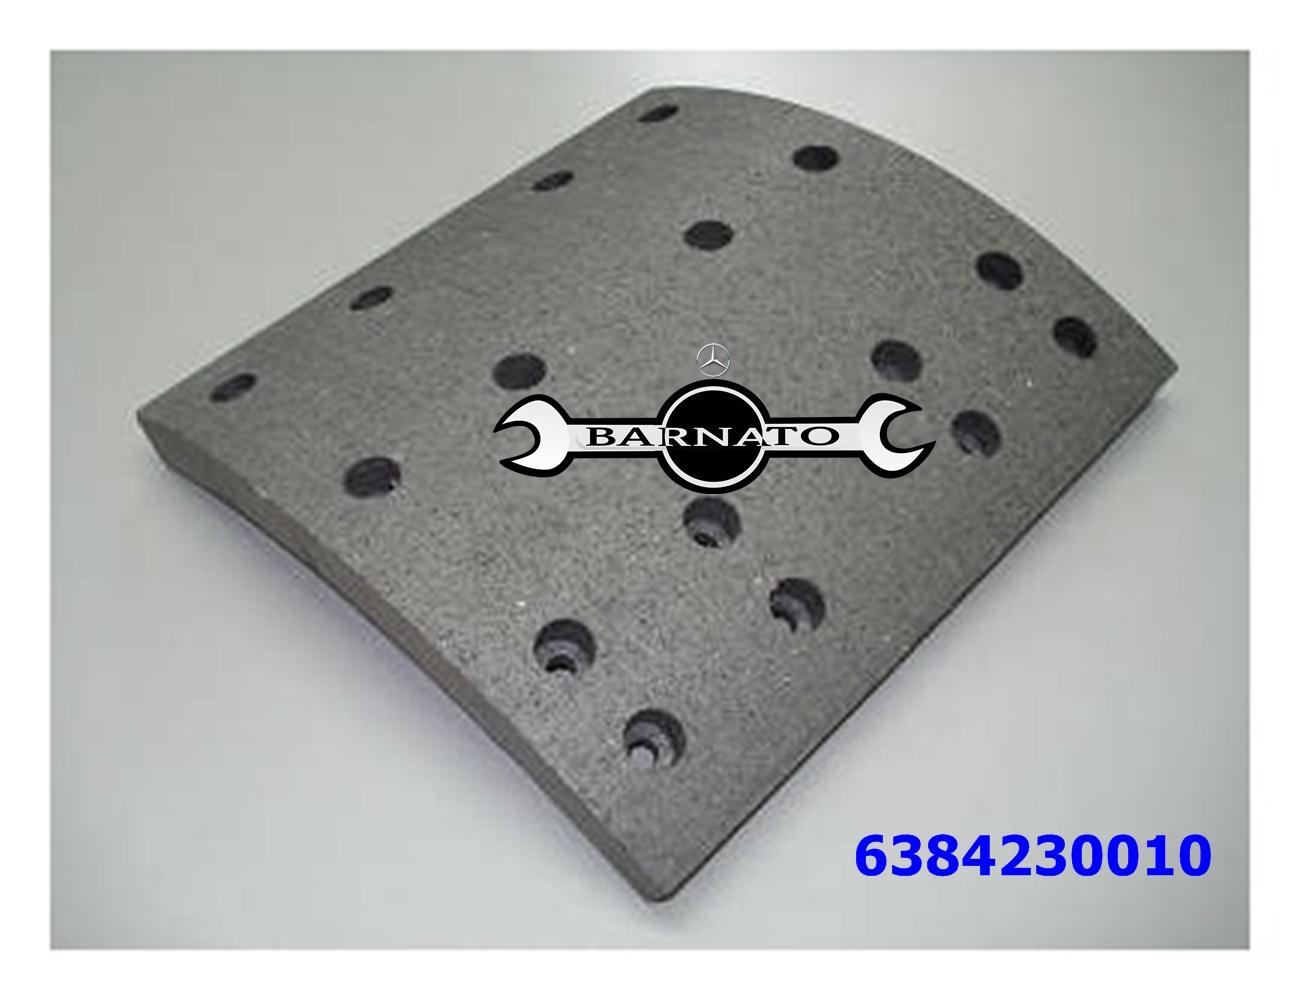 http://www.barnatoloja.com.br/produto.php?cod_produto=6428904